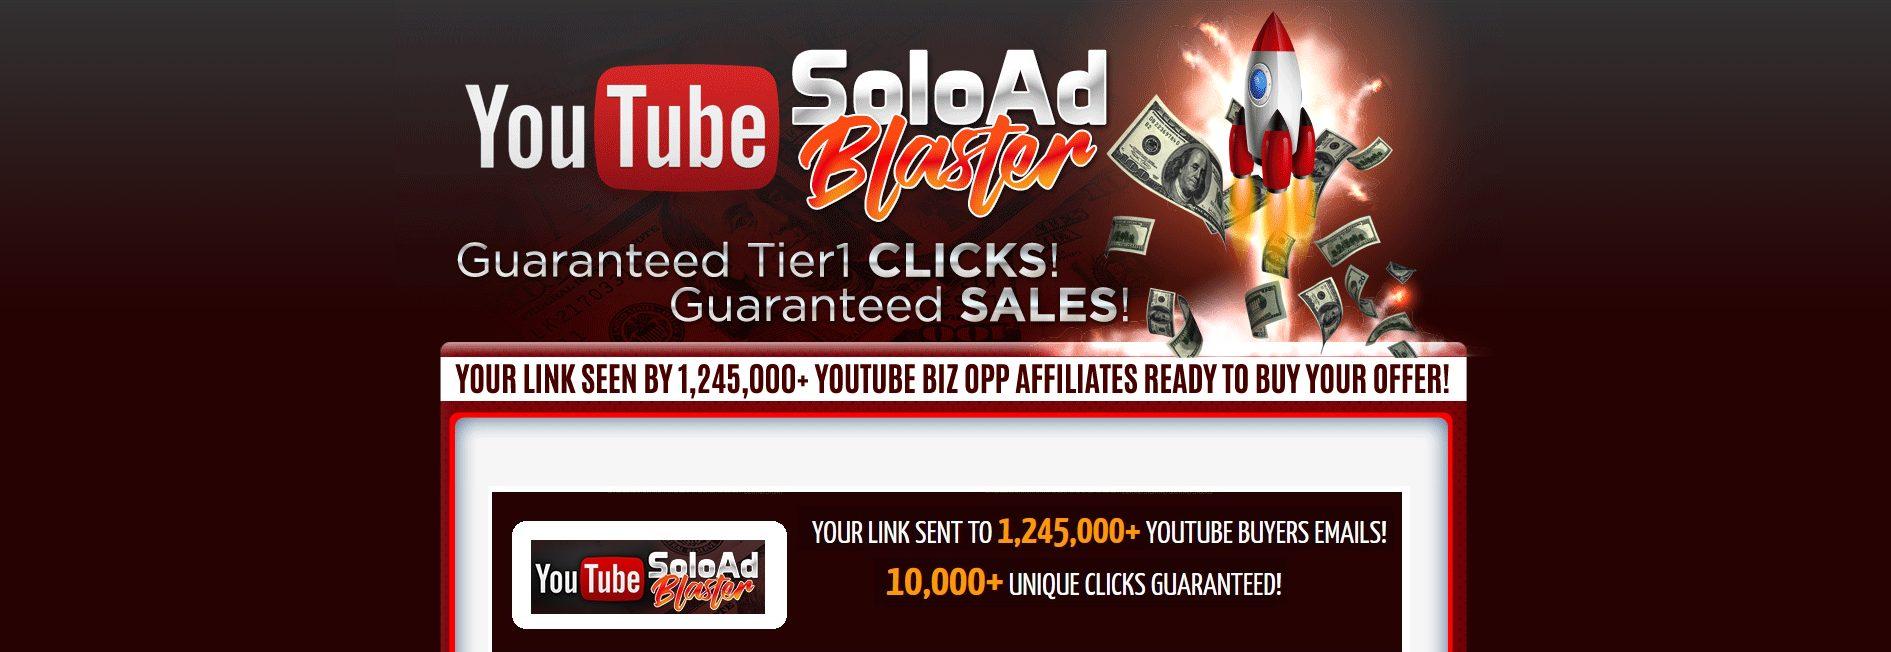 Youtube Solo Ad Blaster software